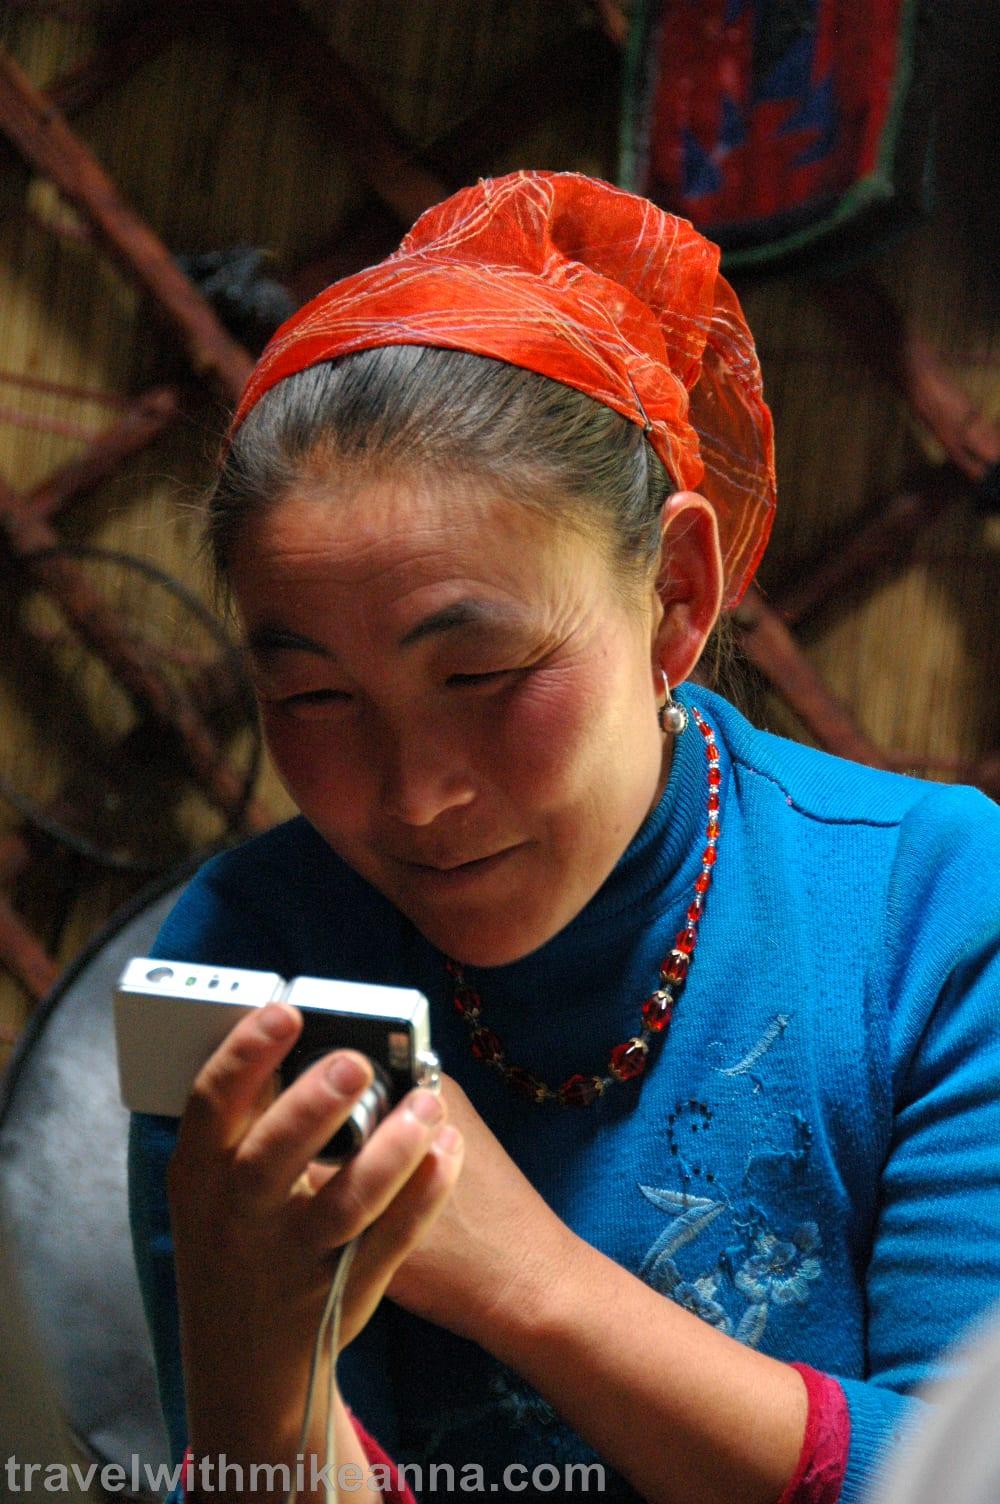 中國 新疆 北疆 旅遊 攝影 照片 遊記 china xinjiang photo photography travel